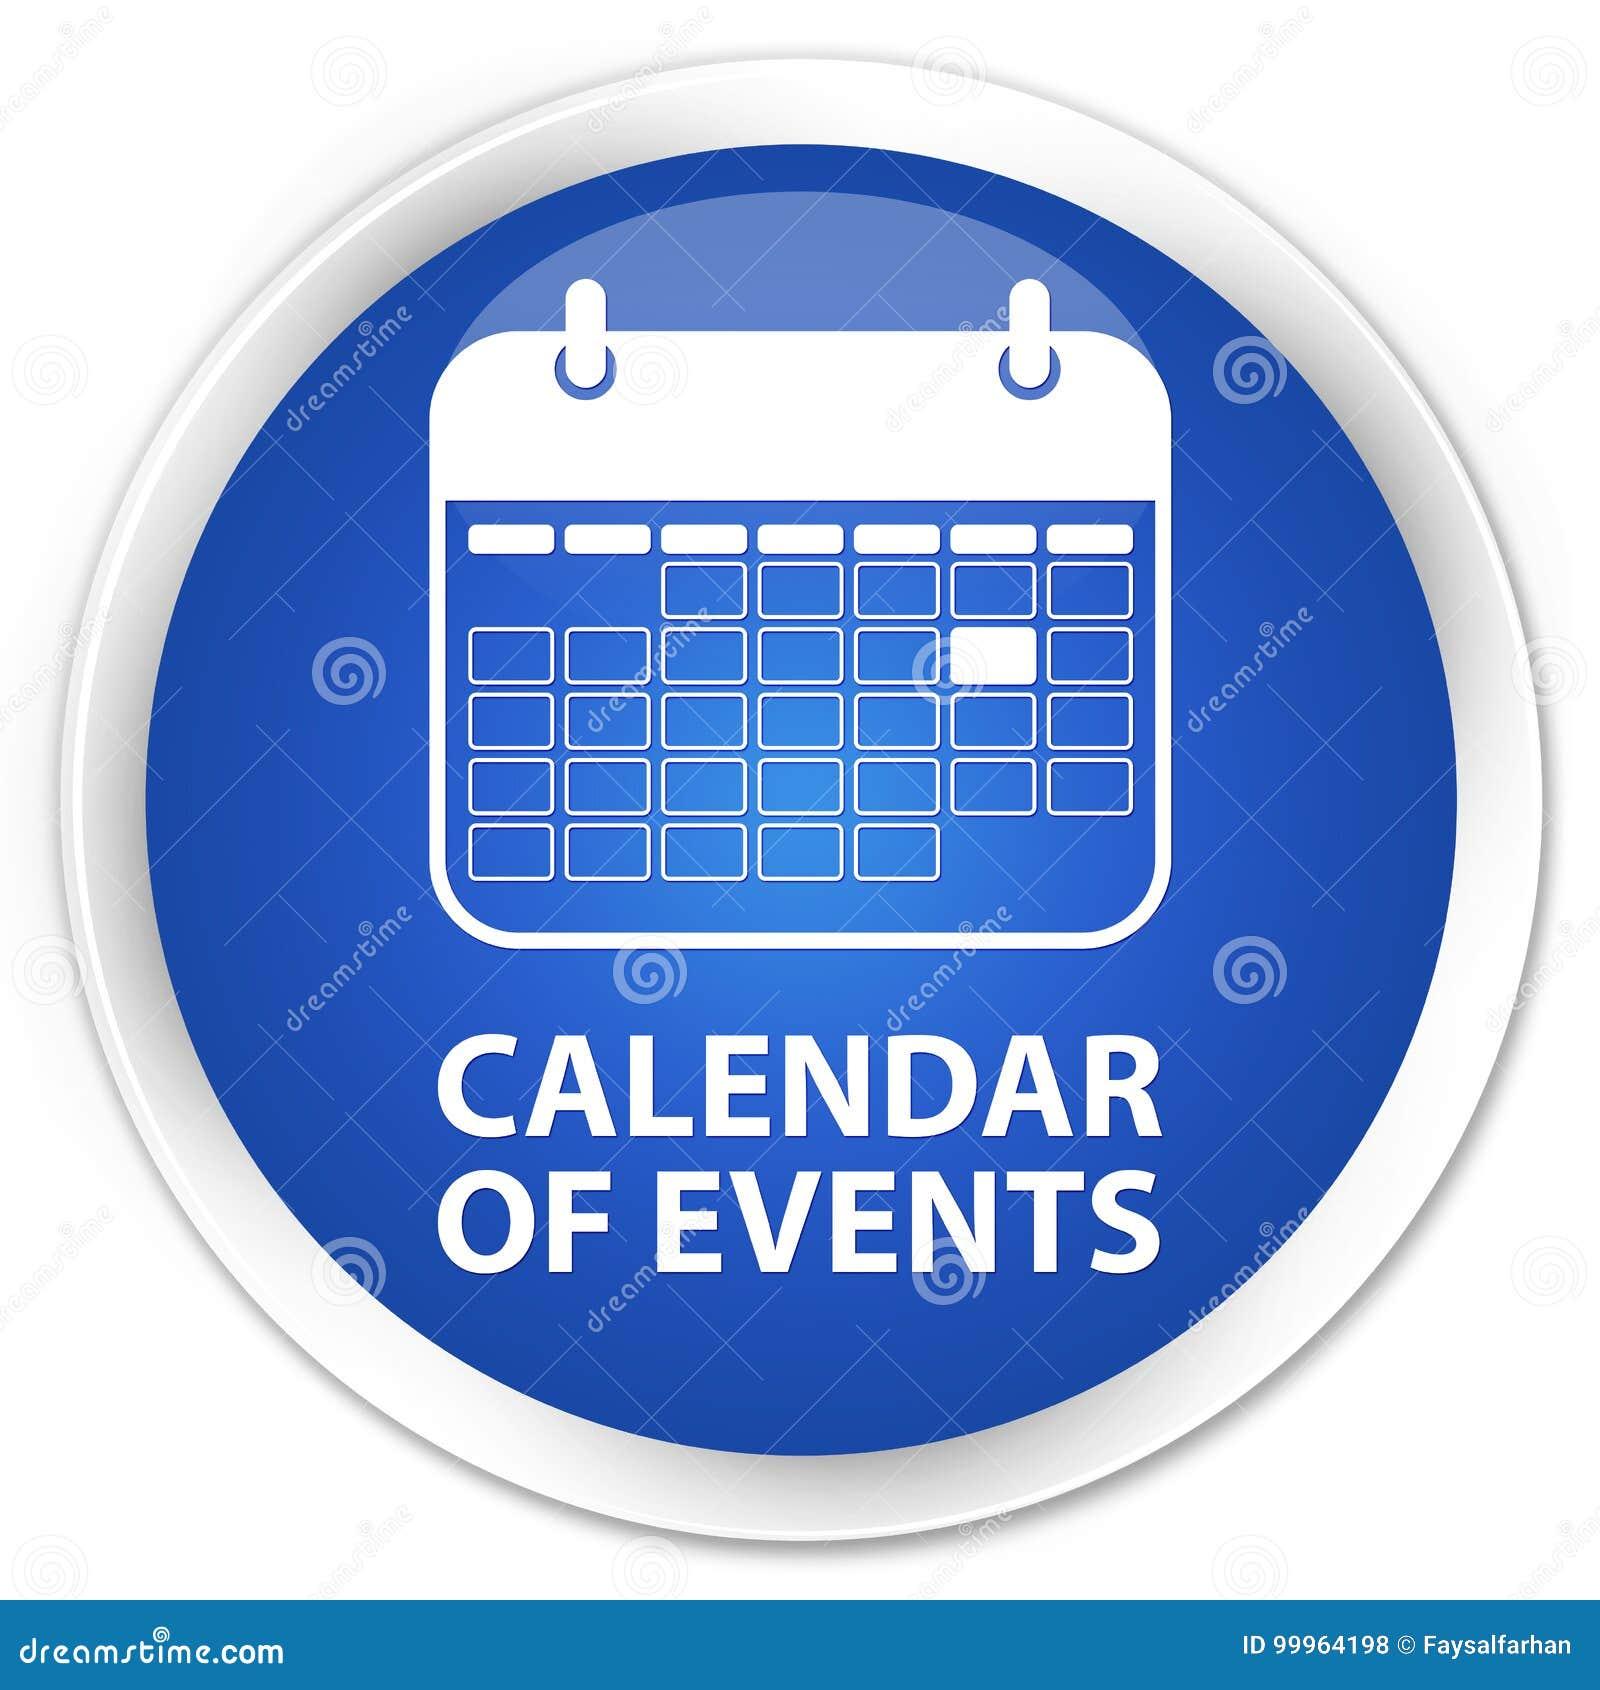 Event Calendar Illustration : Calendar of events premium blue round button stock